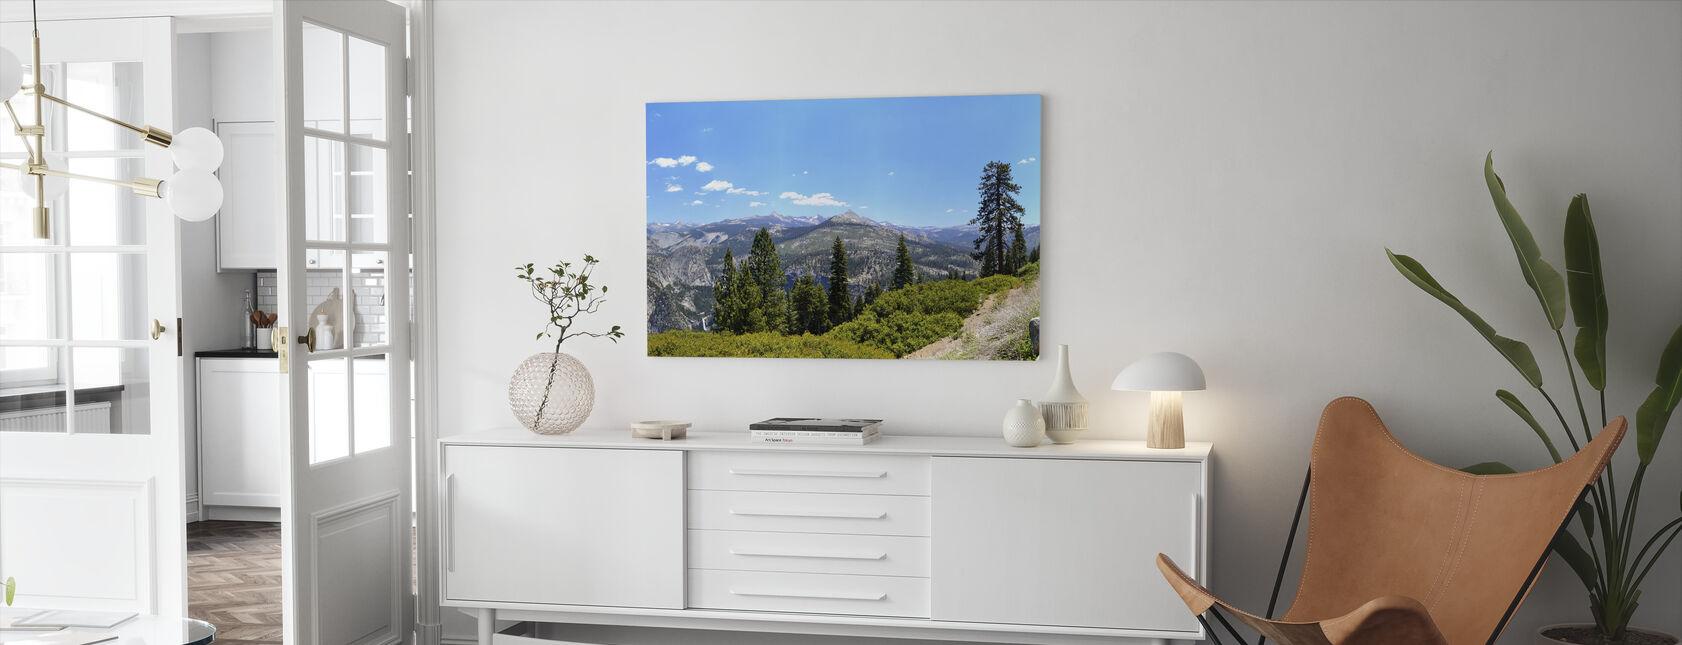 Yosemite National Park - Canvas print - Living Room